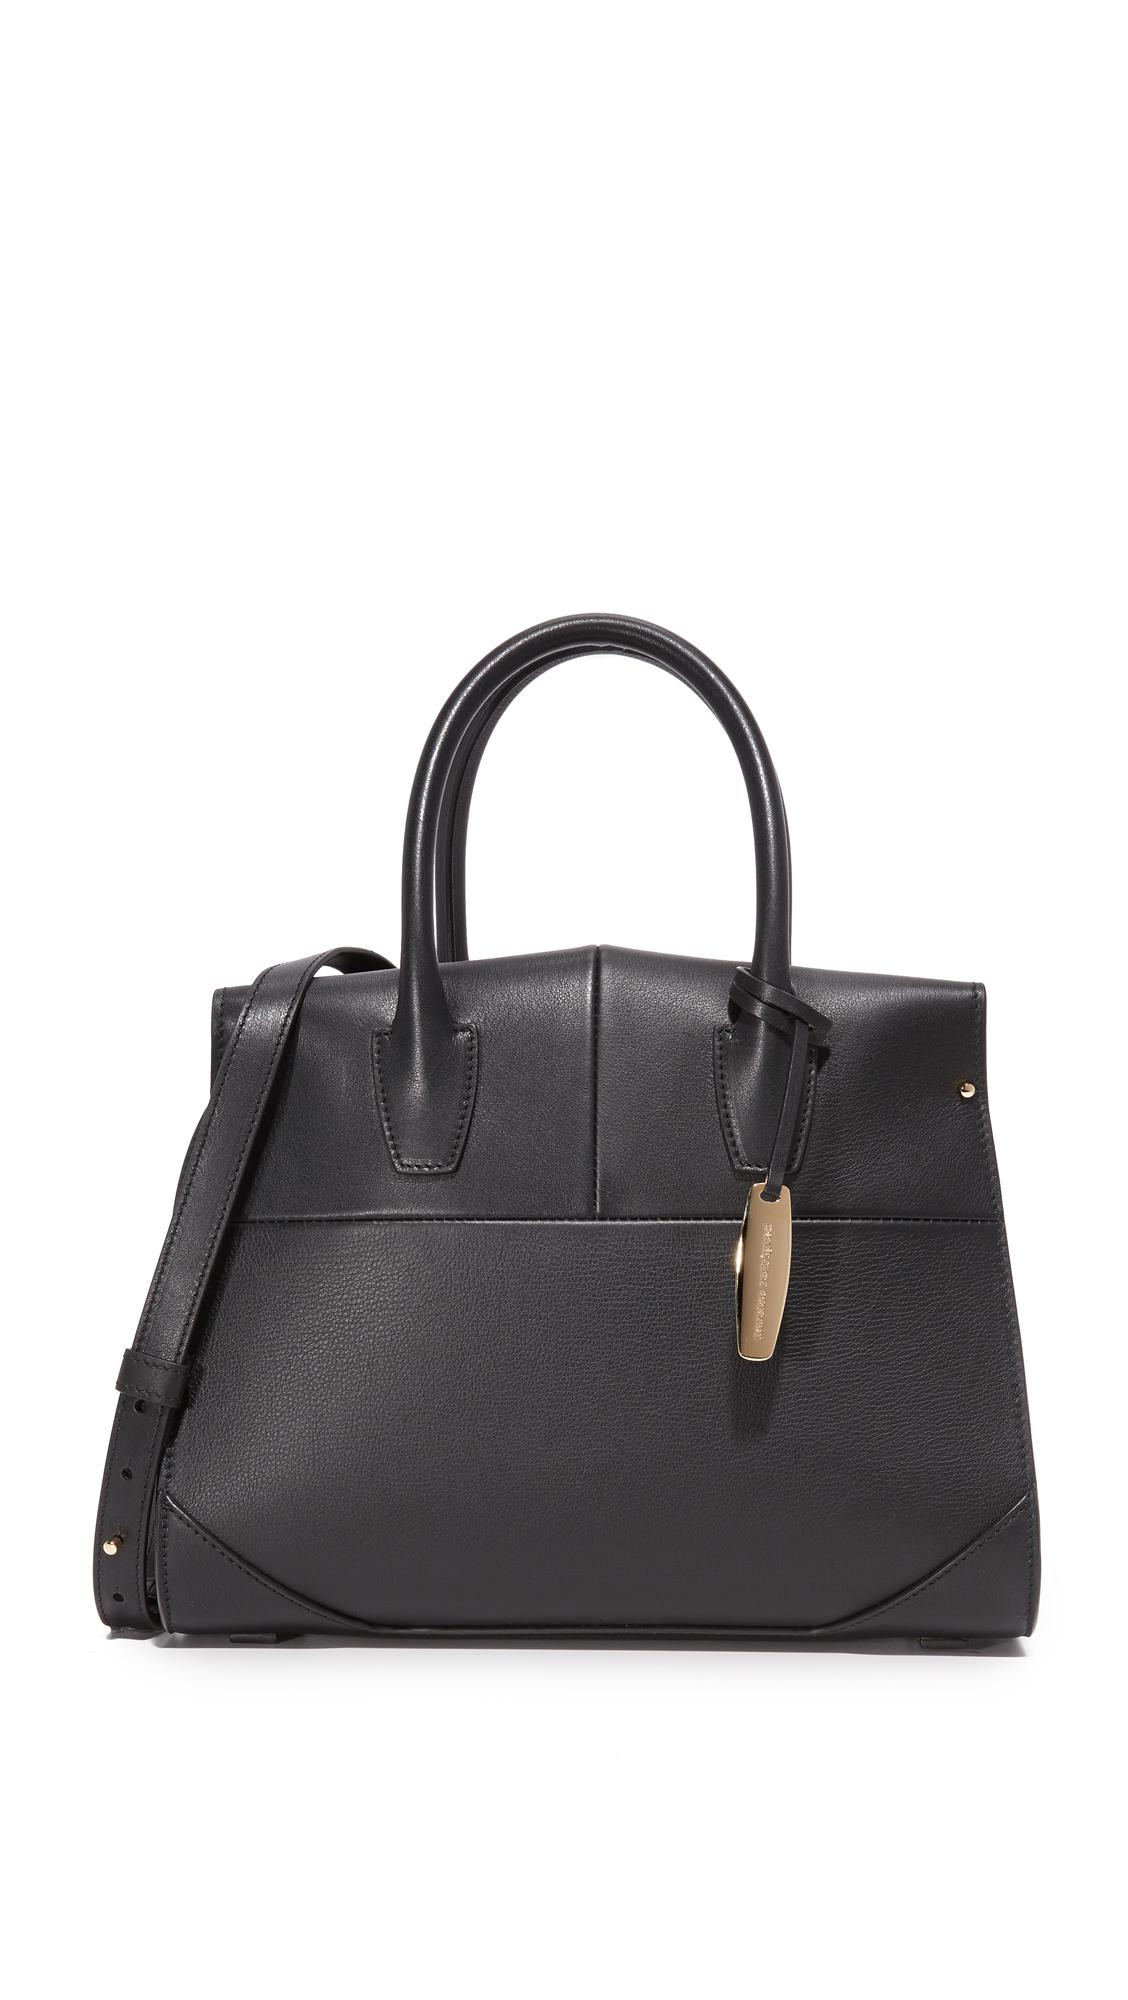 narciso rodriguez female narciso rodriguez top handle bag black